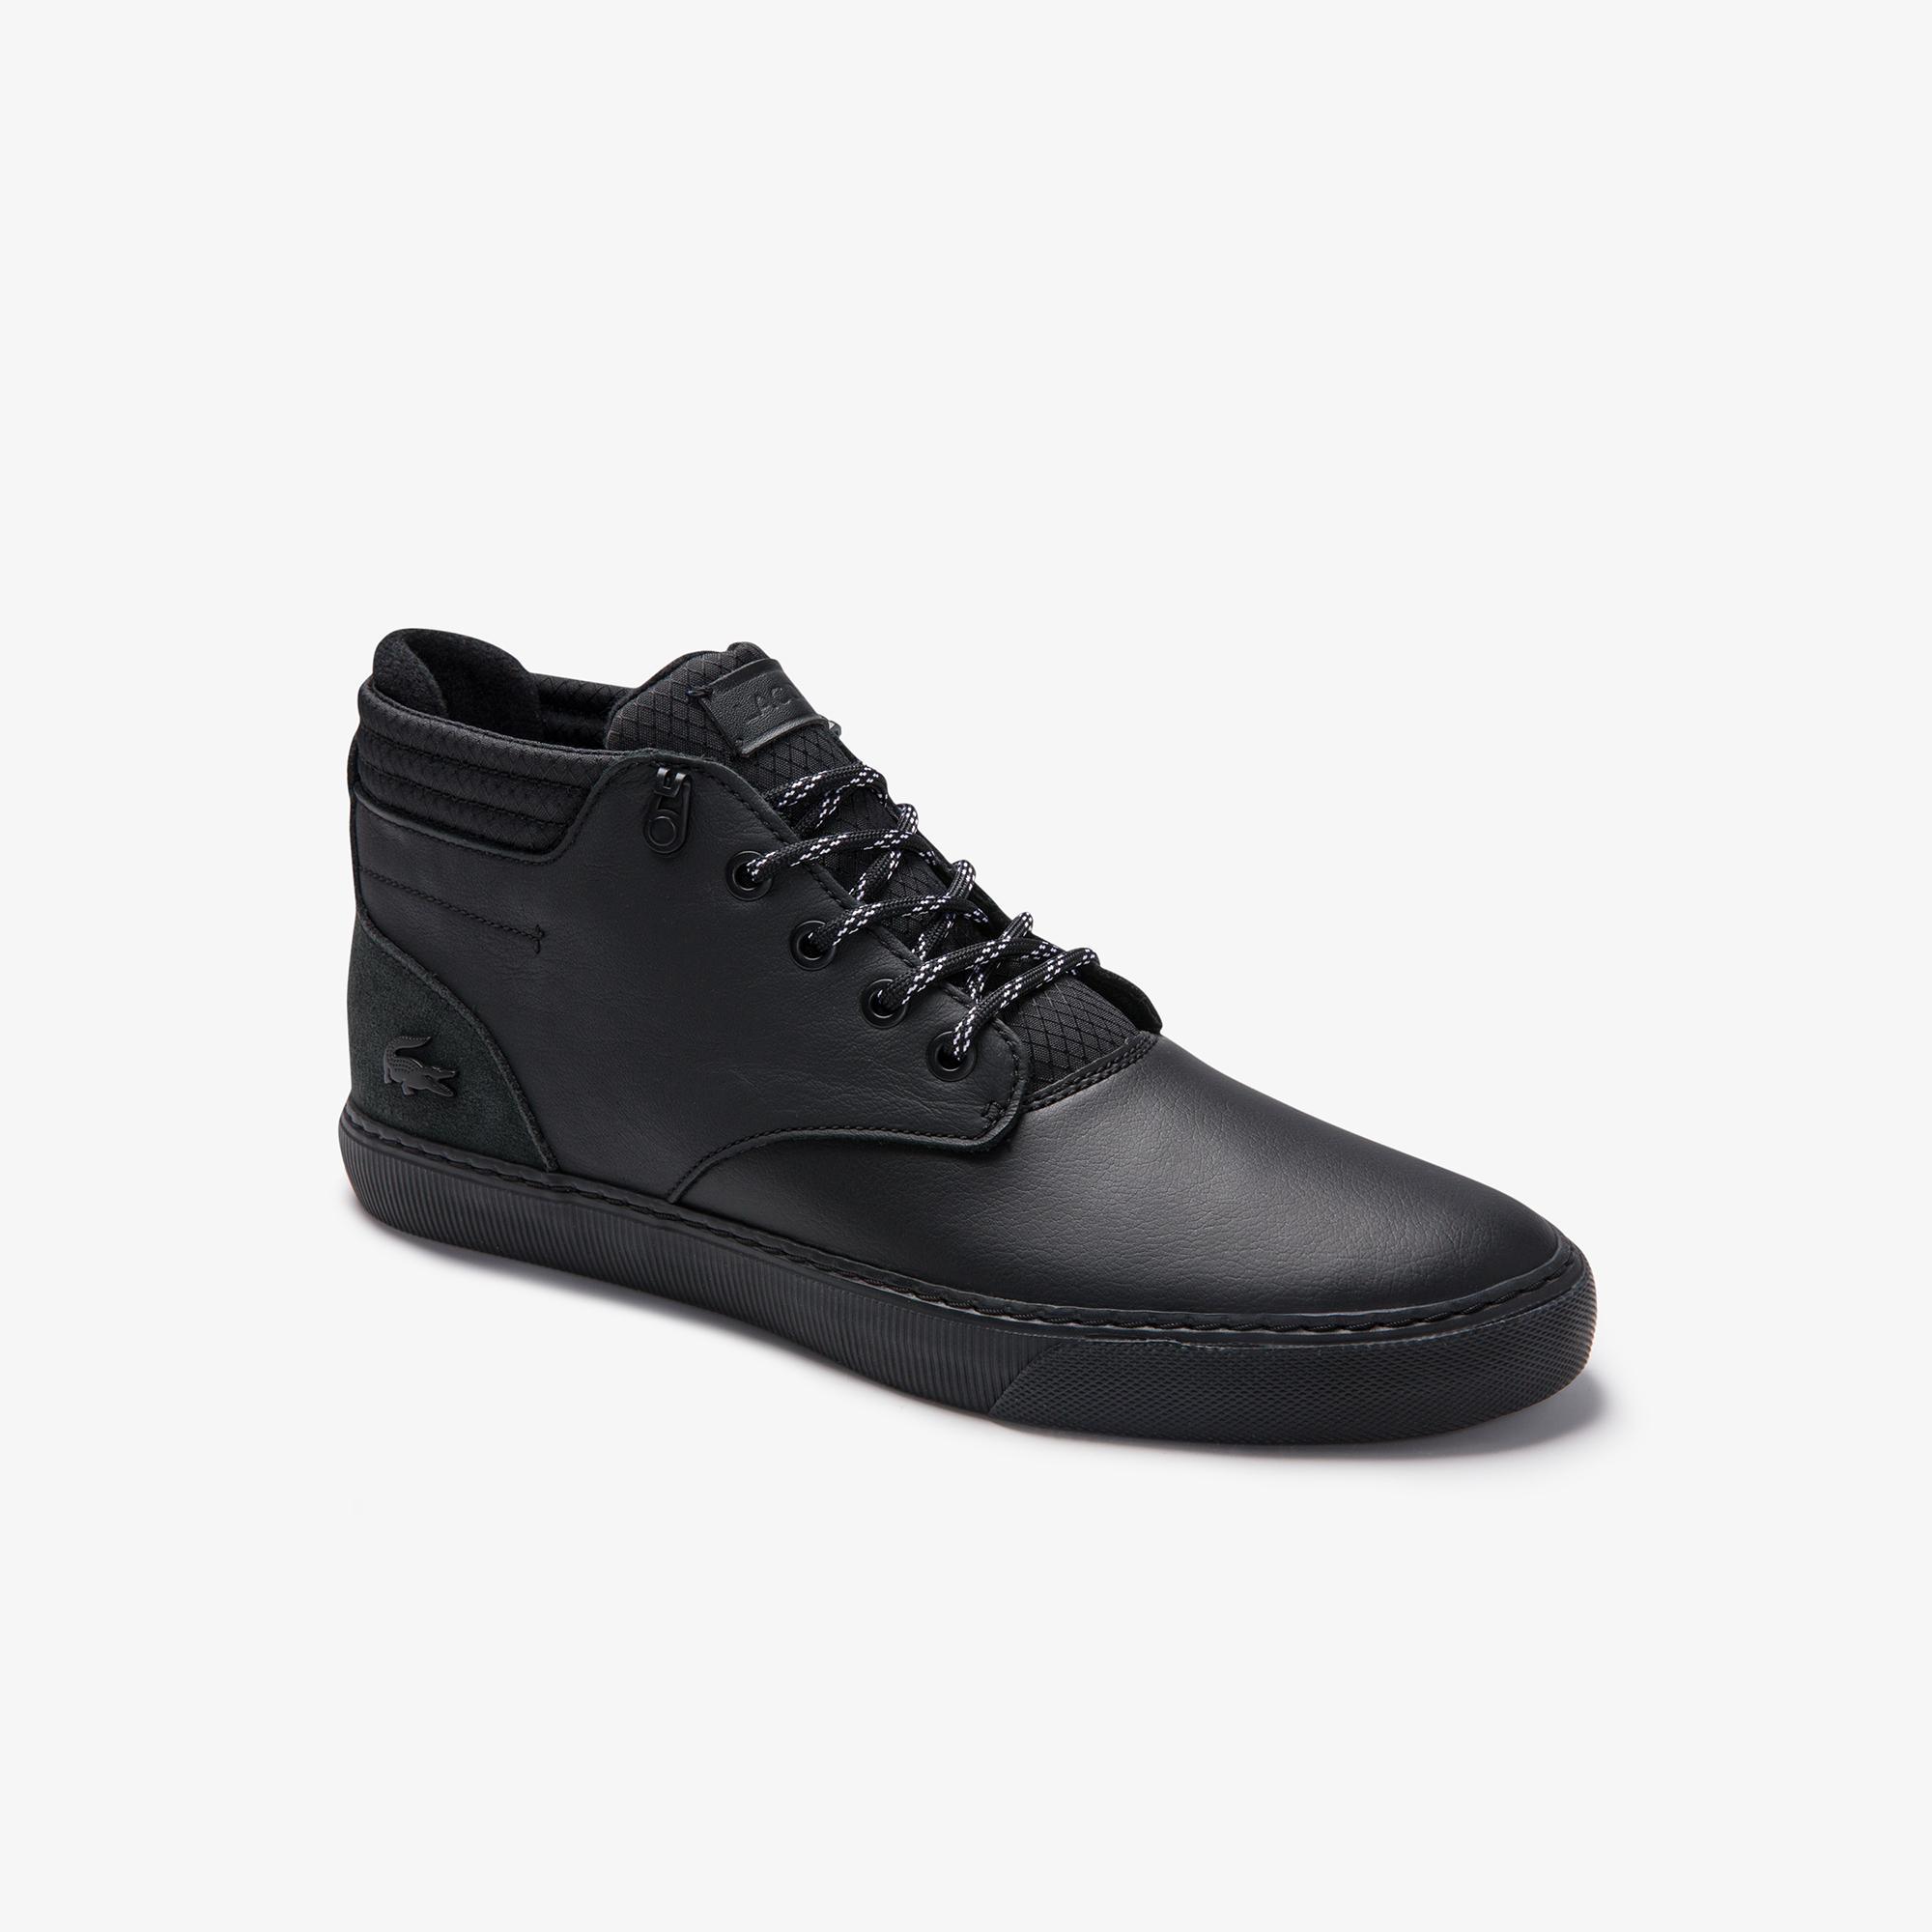 Lacoste Esparre Chukka 0320 1 Cma Erkek Deri Siyah Mid Ayakkabı